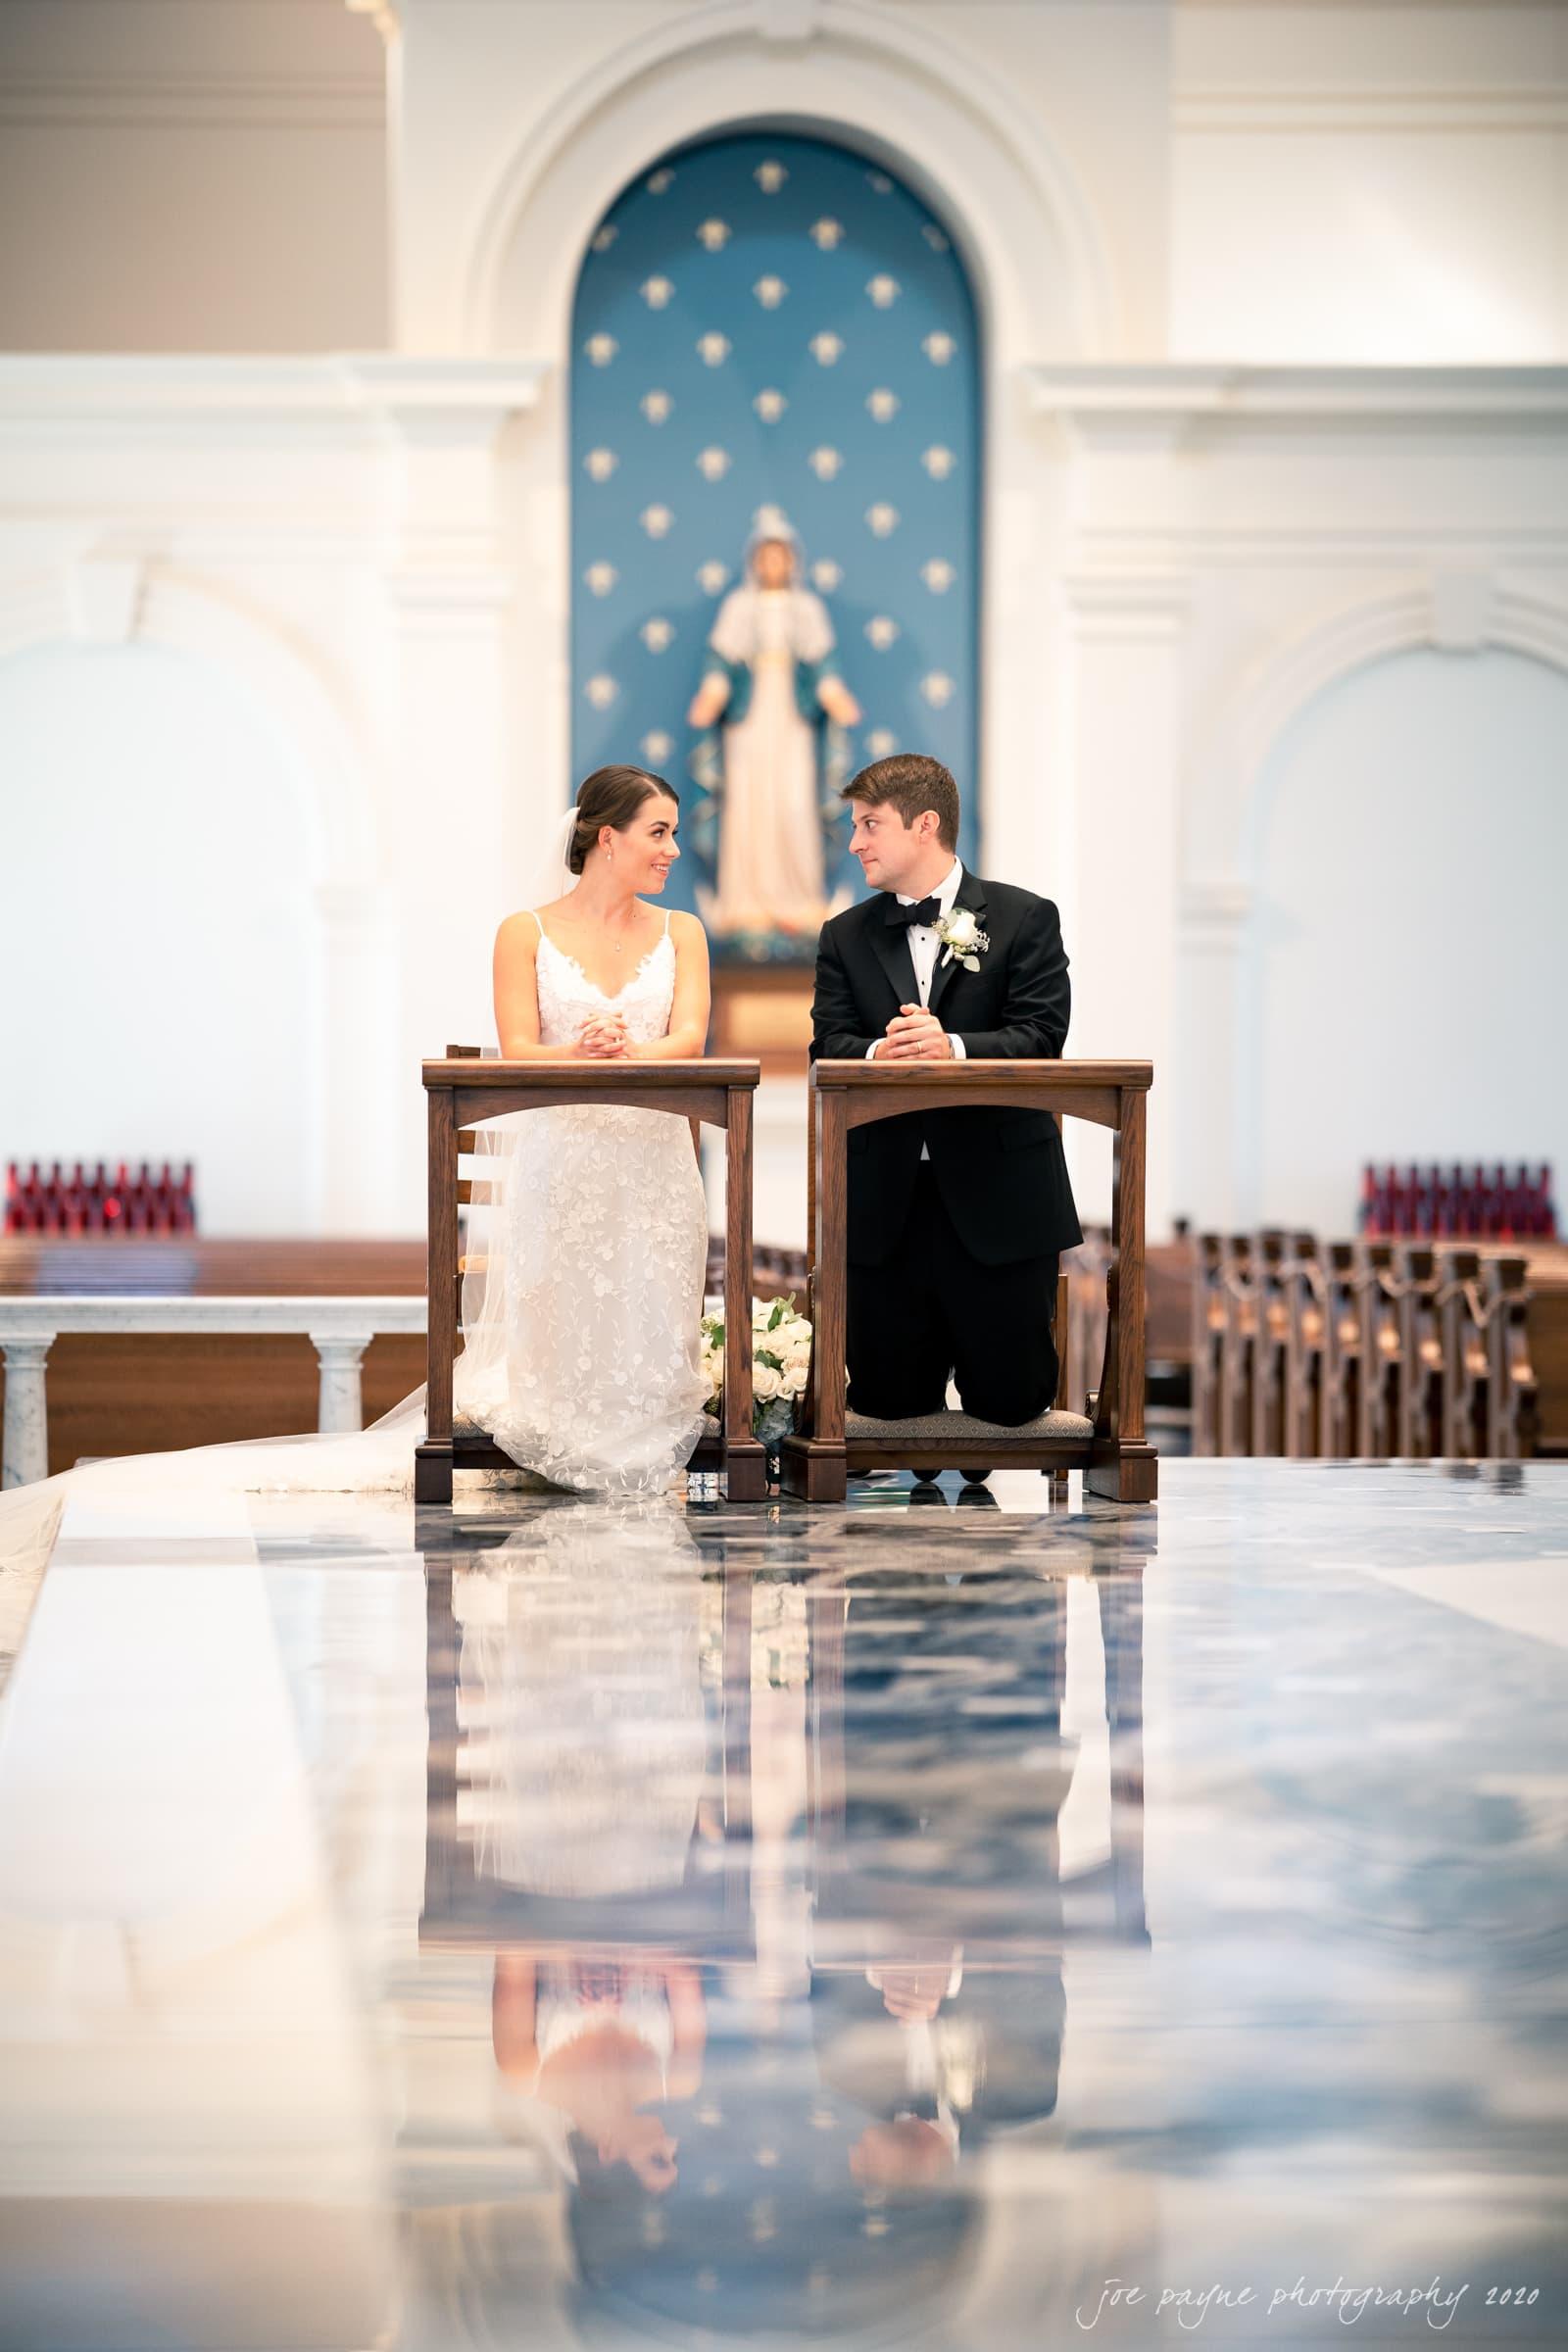 Holy Name of Jesus wedding - couple chatting